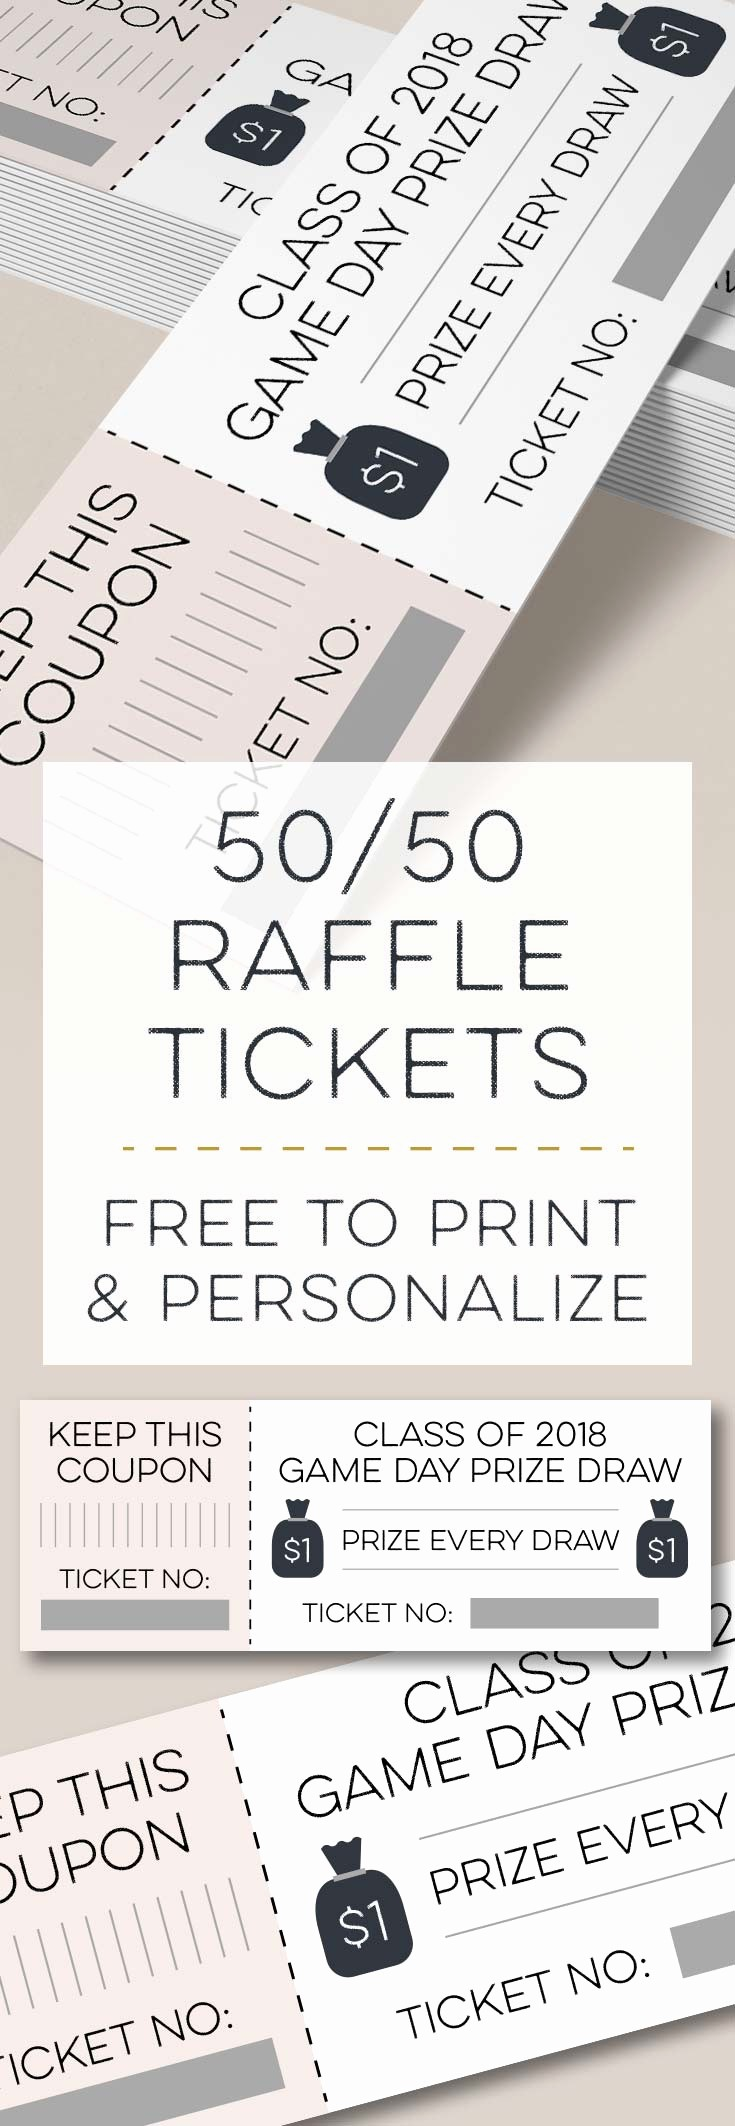 50 50 Raffle Ticket Template Luxury Moneybags 50 50 Raffle Tickets